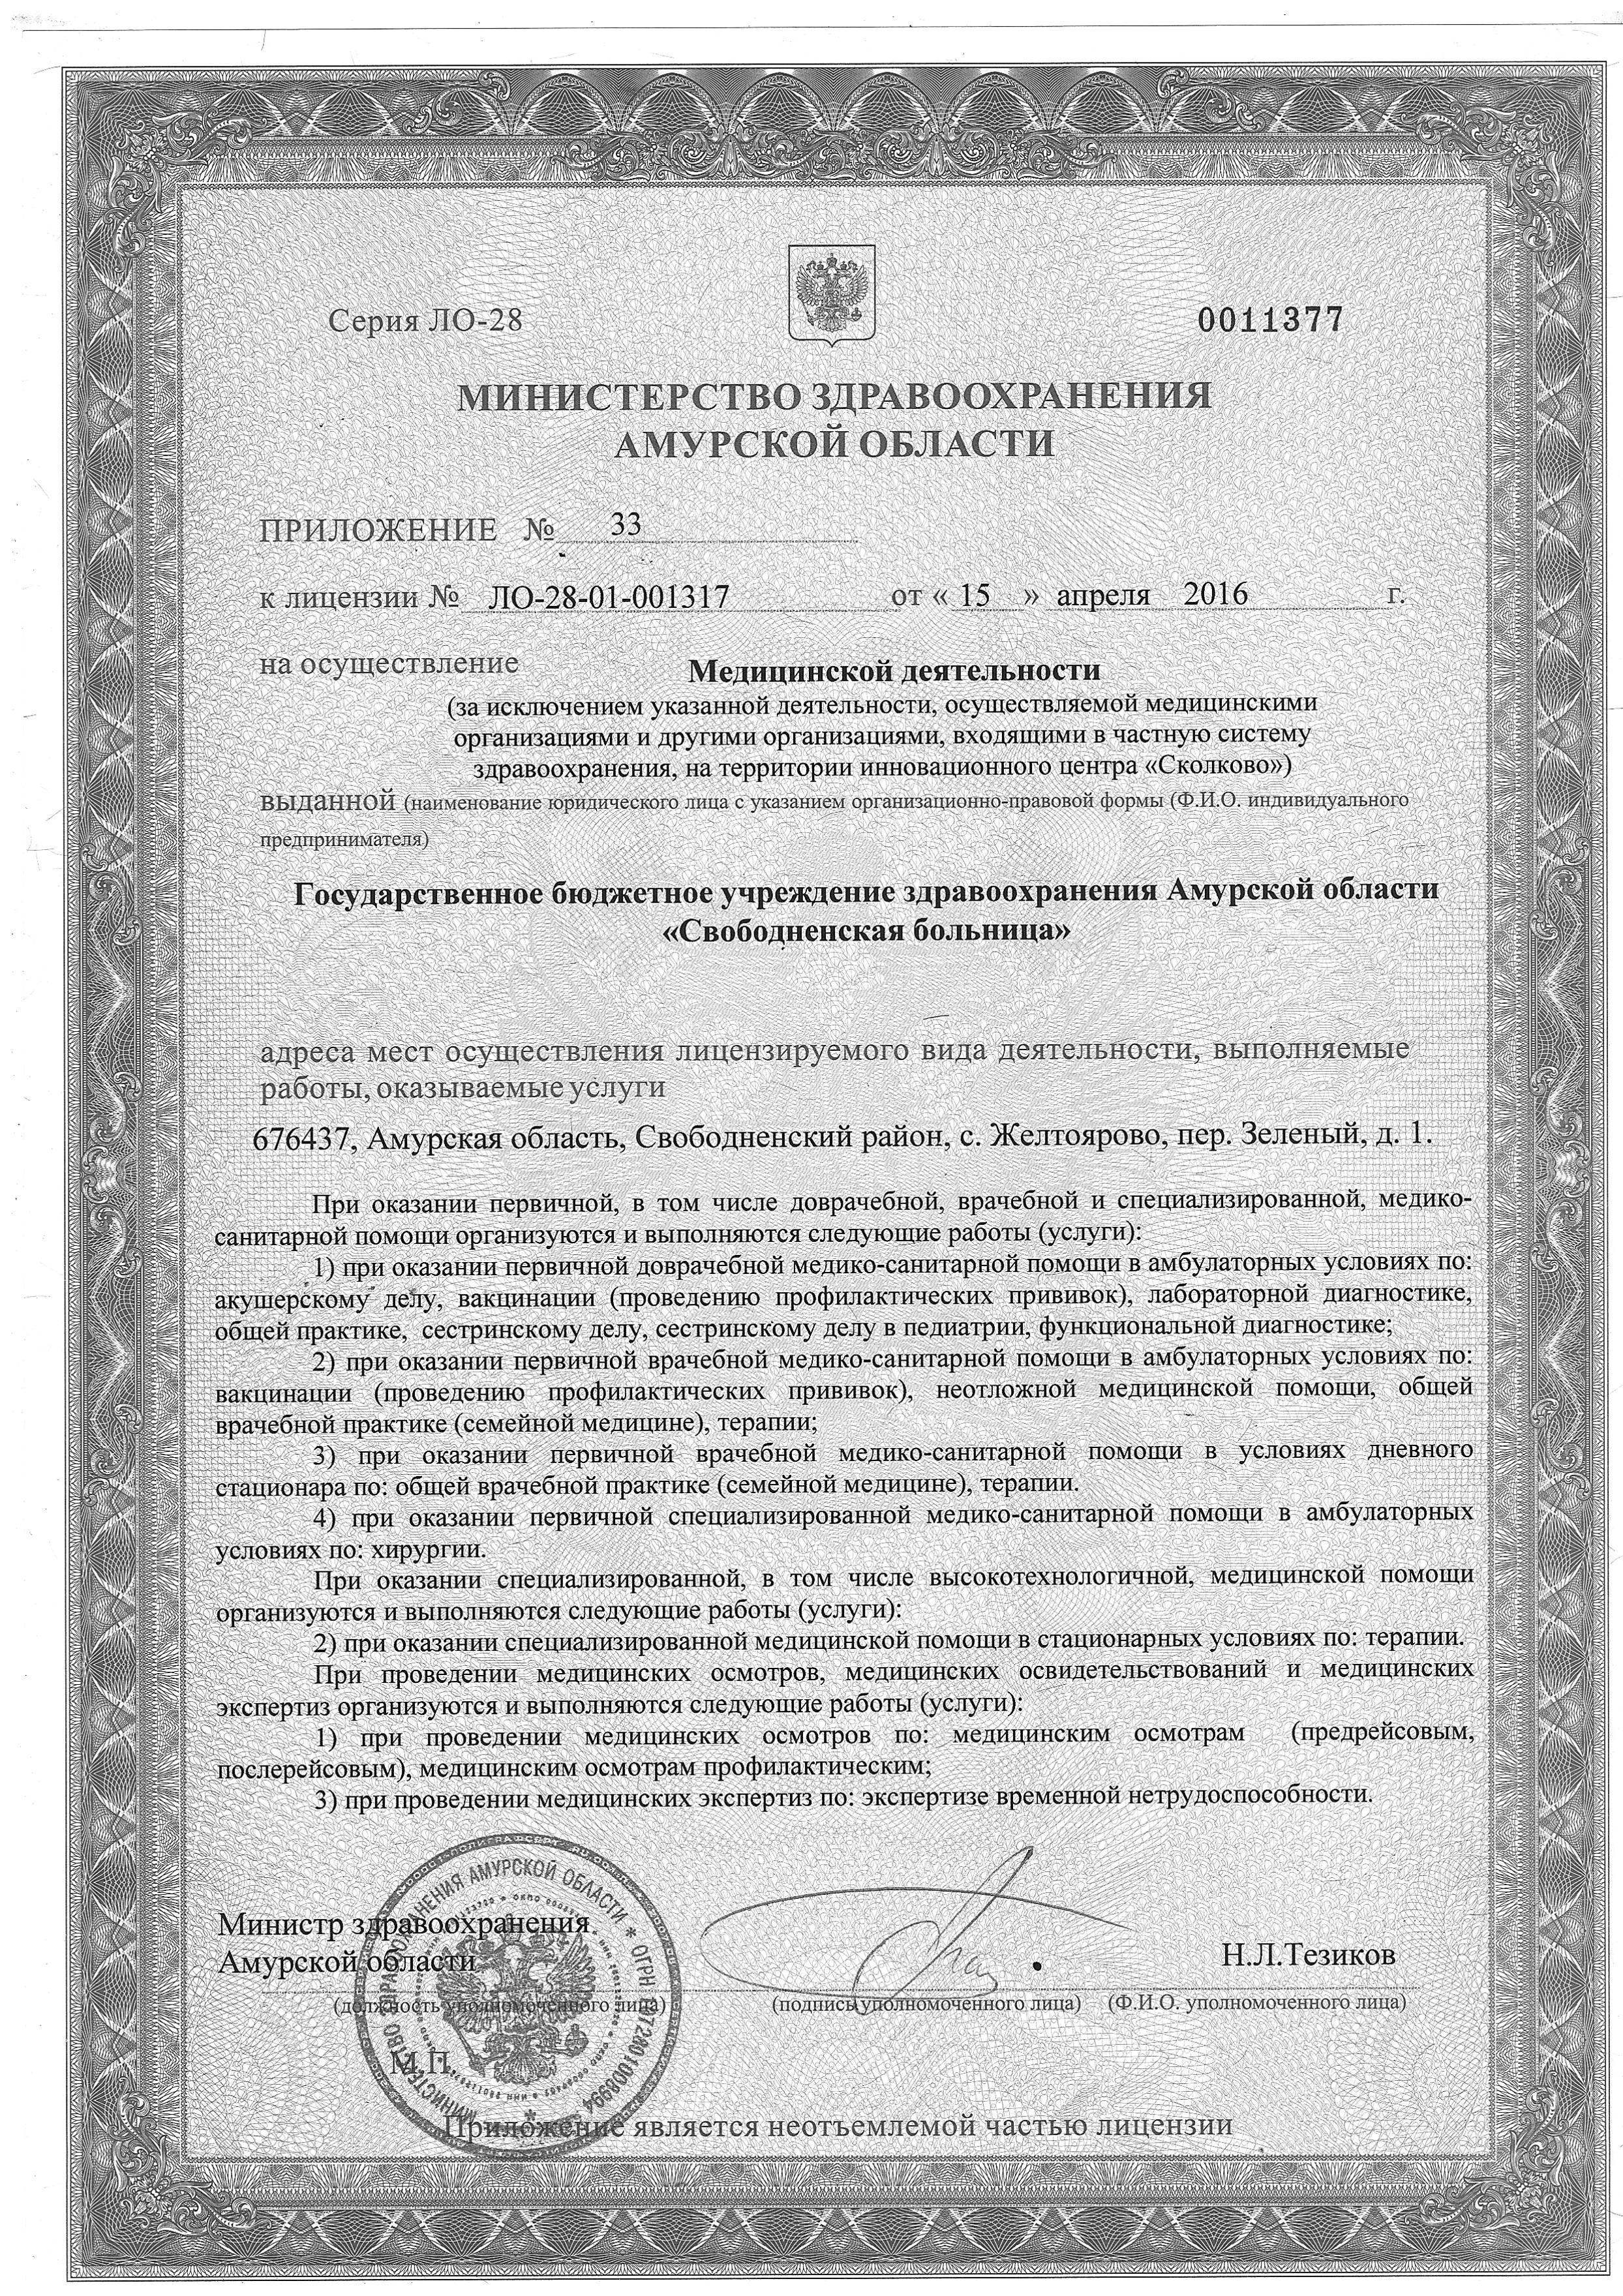 Желтоярово_01